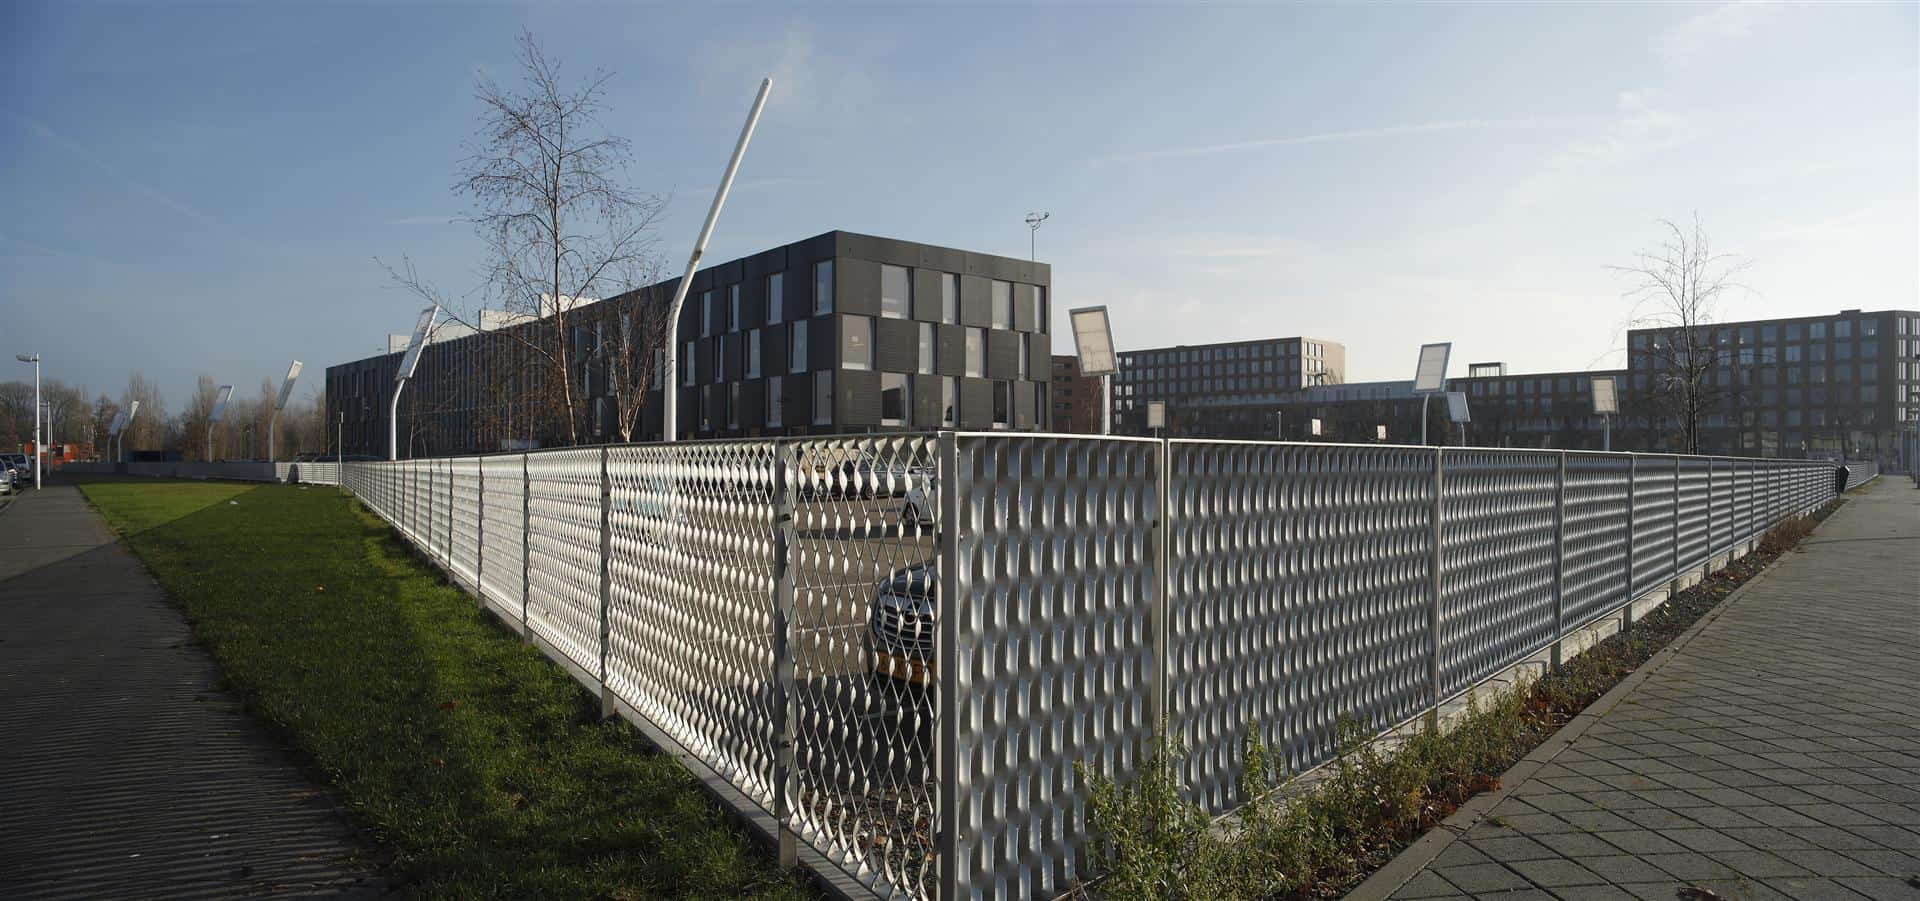 MD Strekmetaal gevelbekleding MD Expanded metal facade